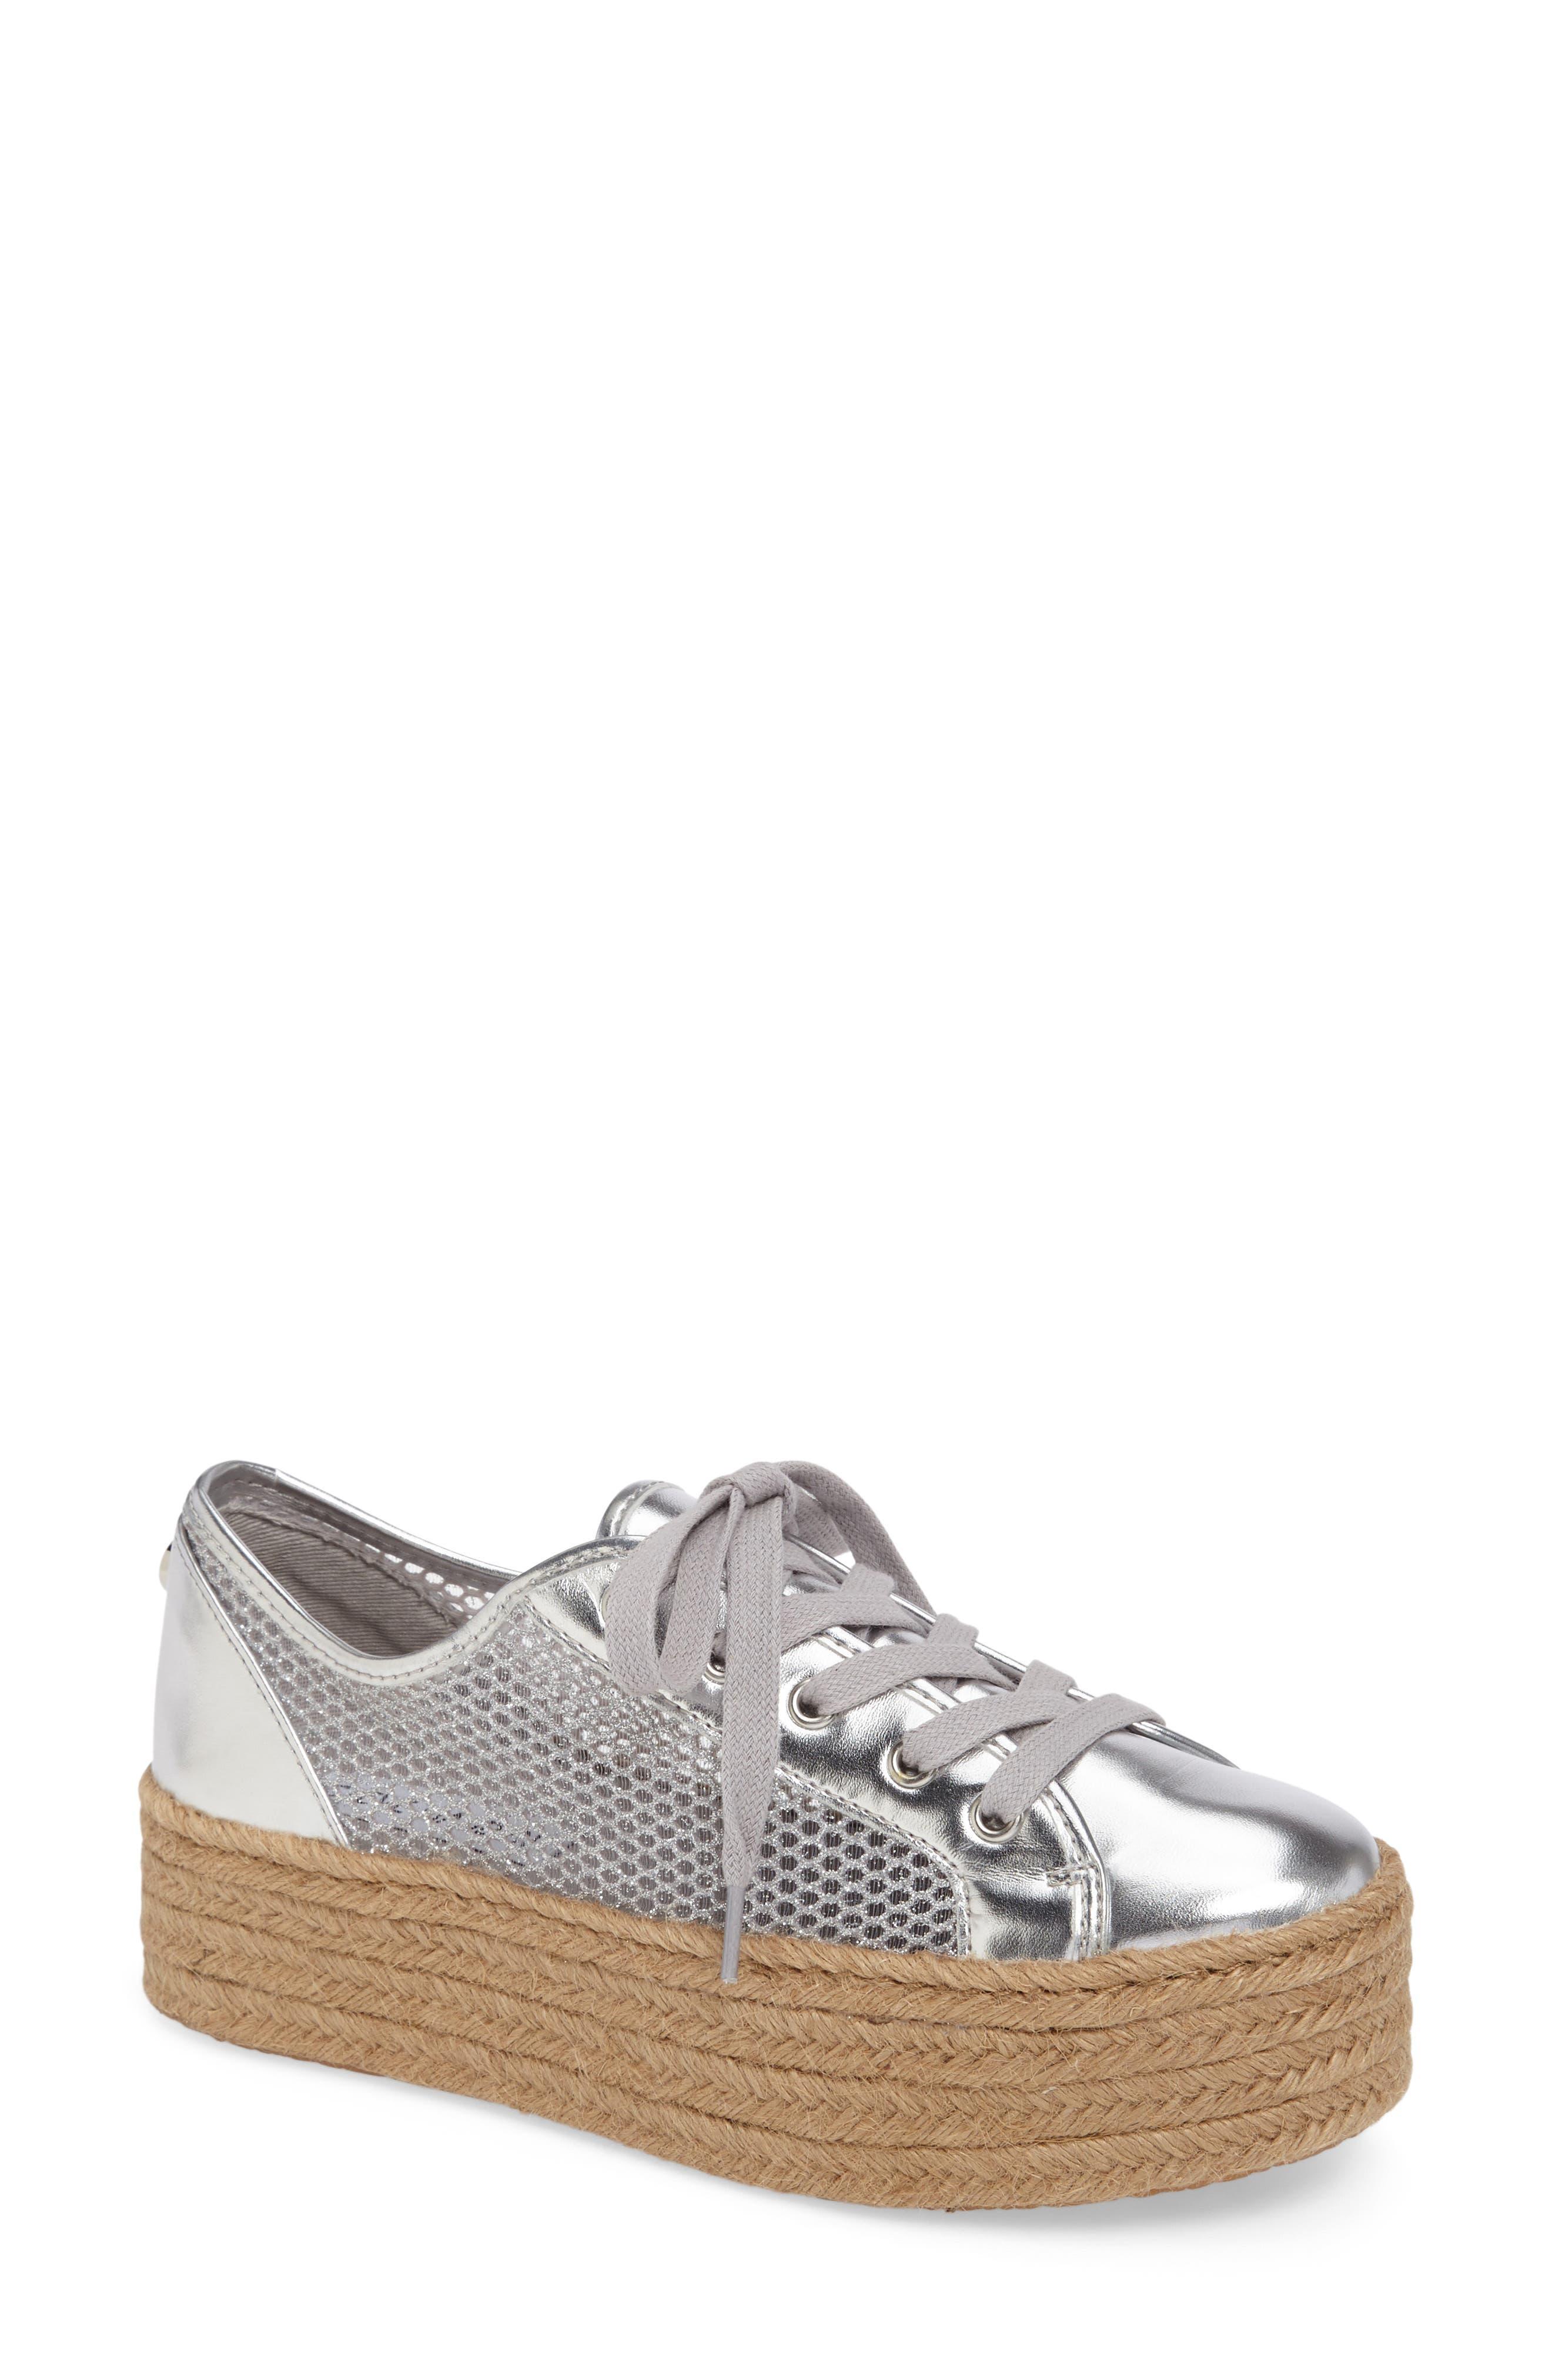 Mars Platform Sneaker,                         Main,                         color, 040